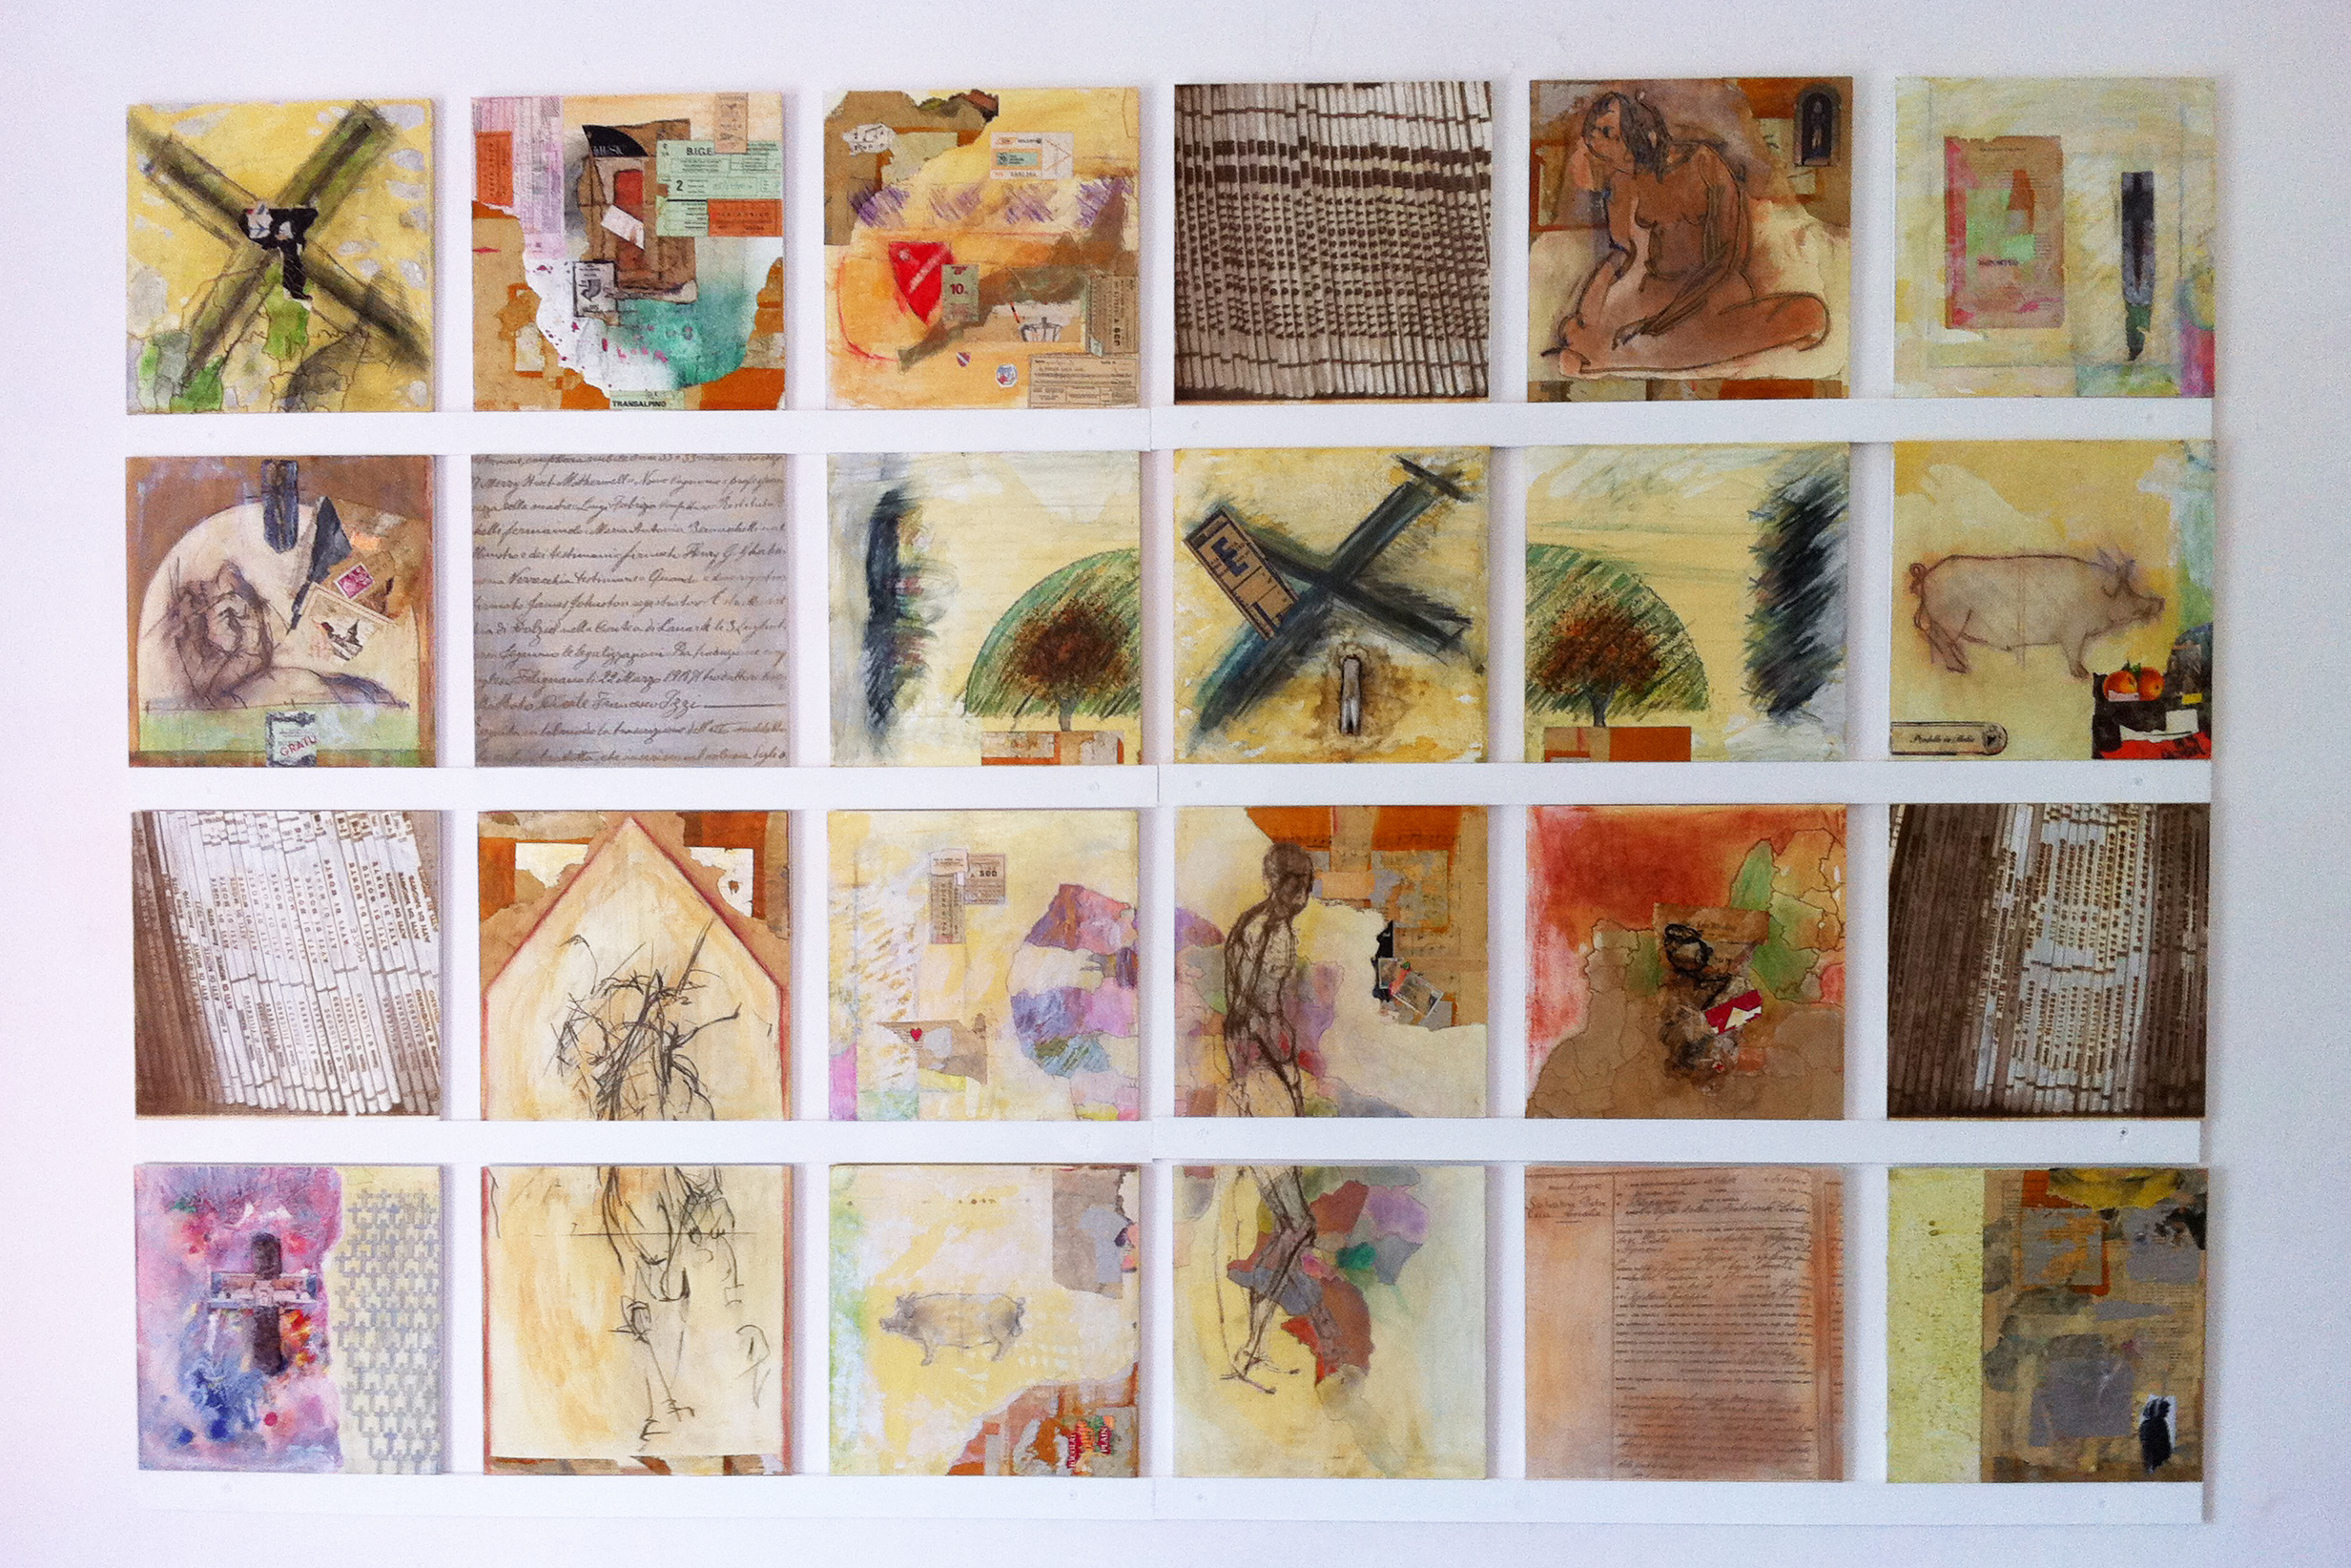 Elaine Shemilt 'The Function of Dreams' Mixed media on board Single work comprising twenty-four panels 2012 205 x 135cm Collezione Angela e Tonino Buono © Cultural Documents